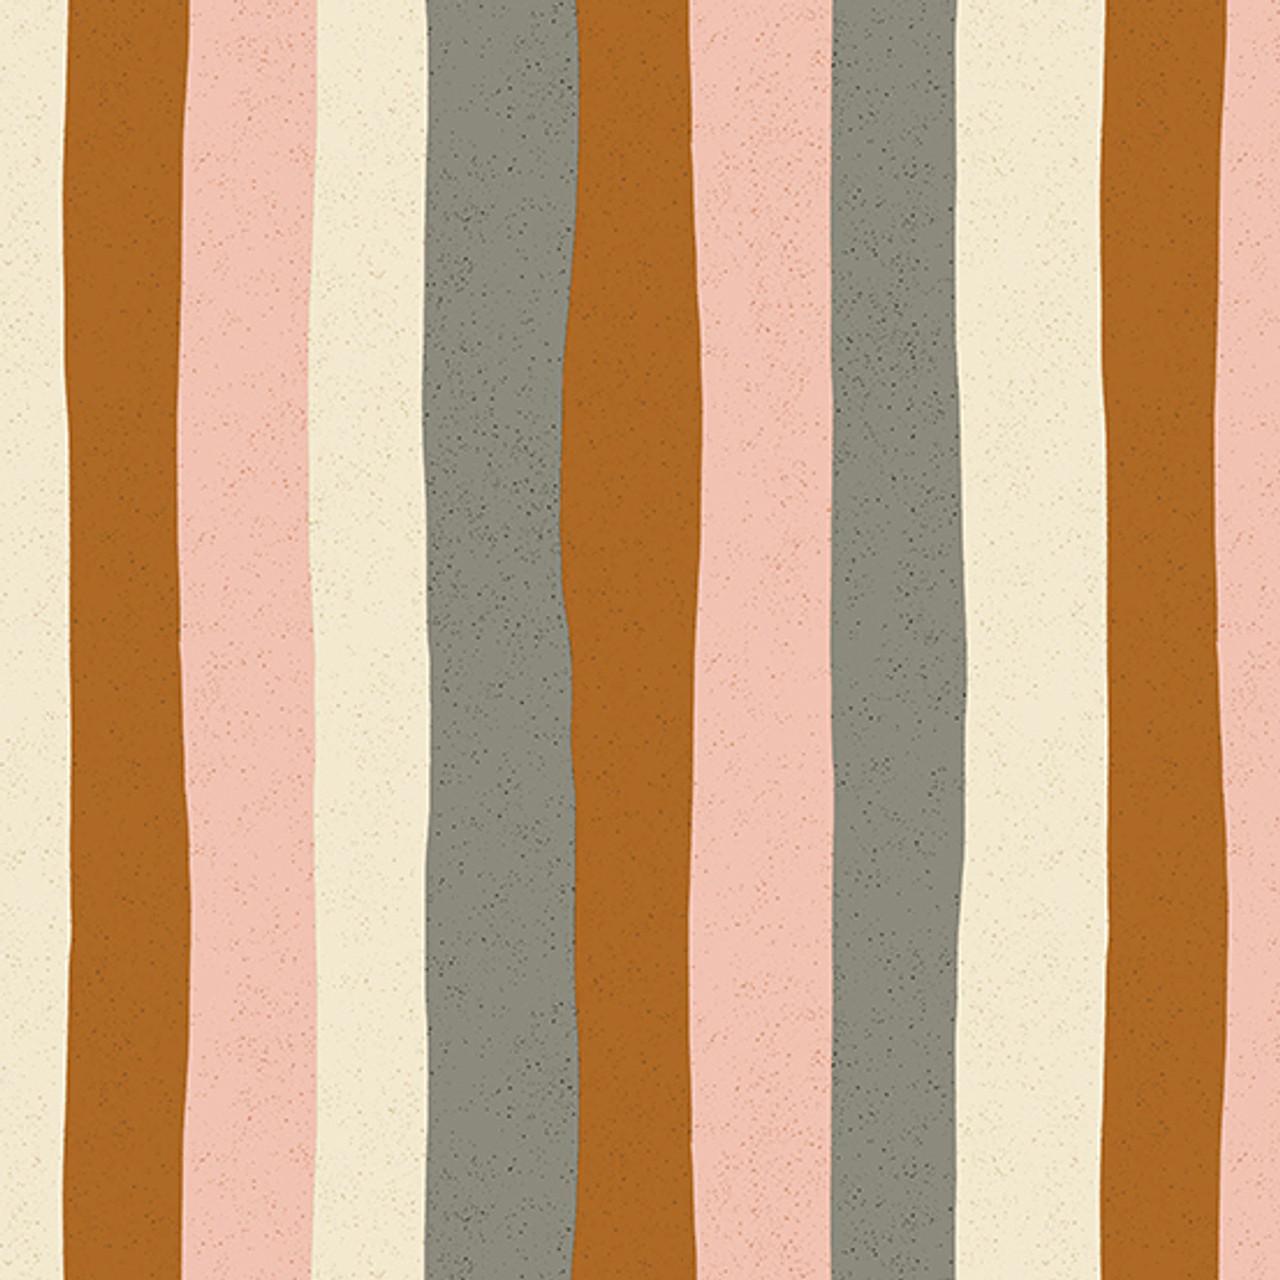 Perennial - Stripes (Pink Lemonade)